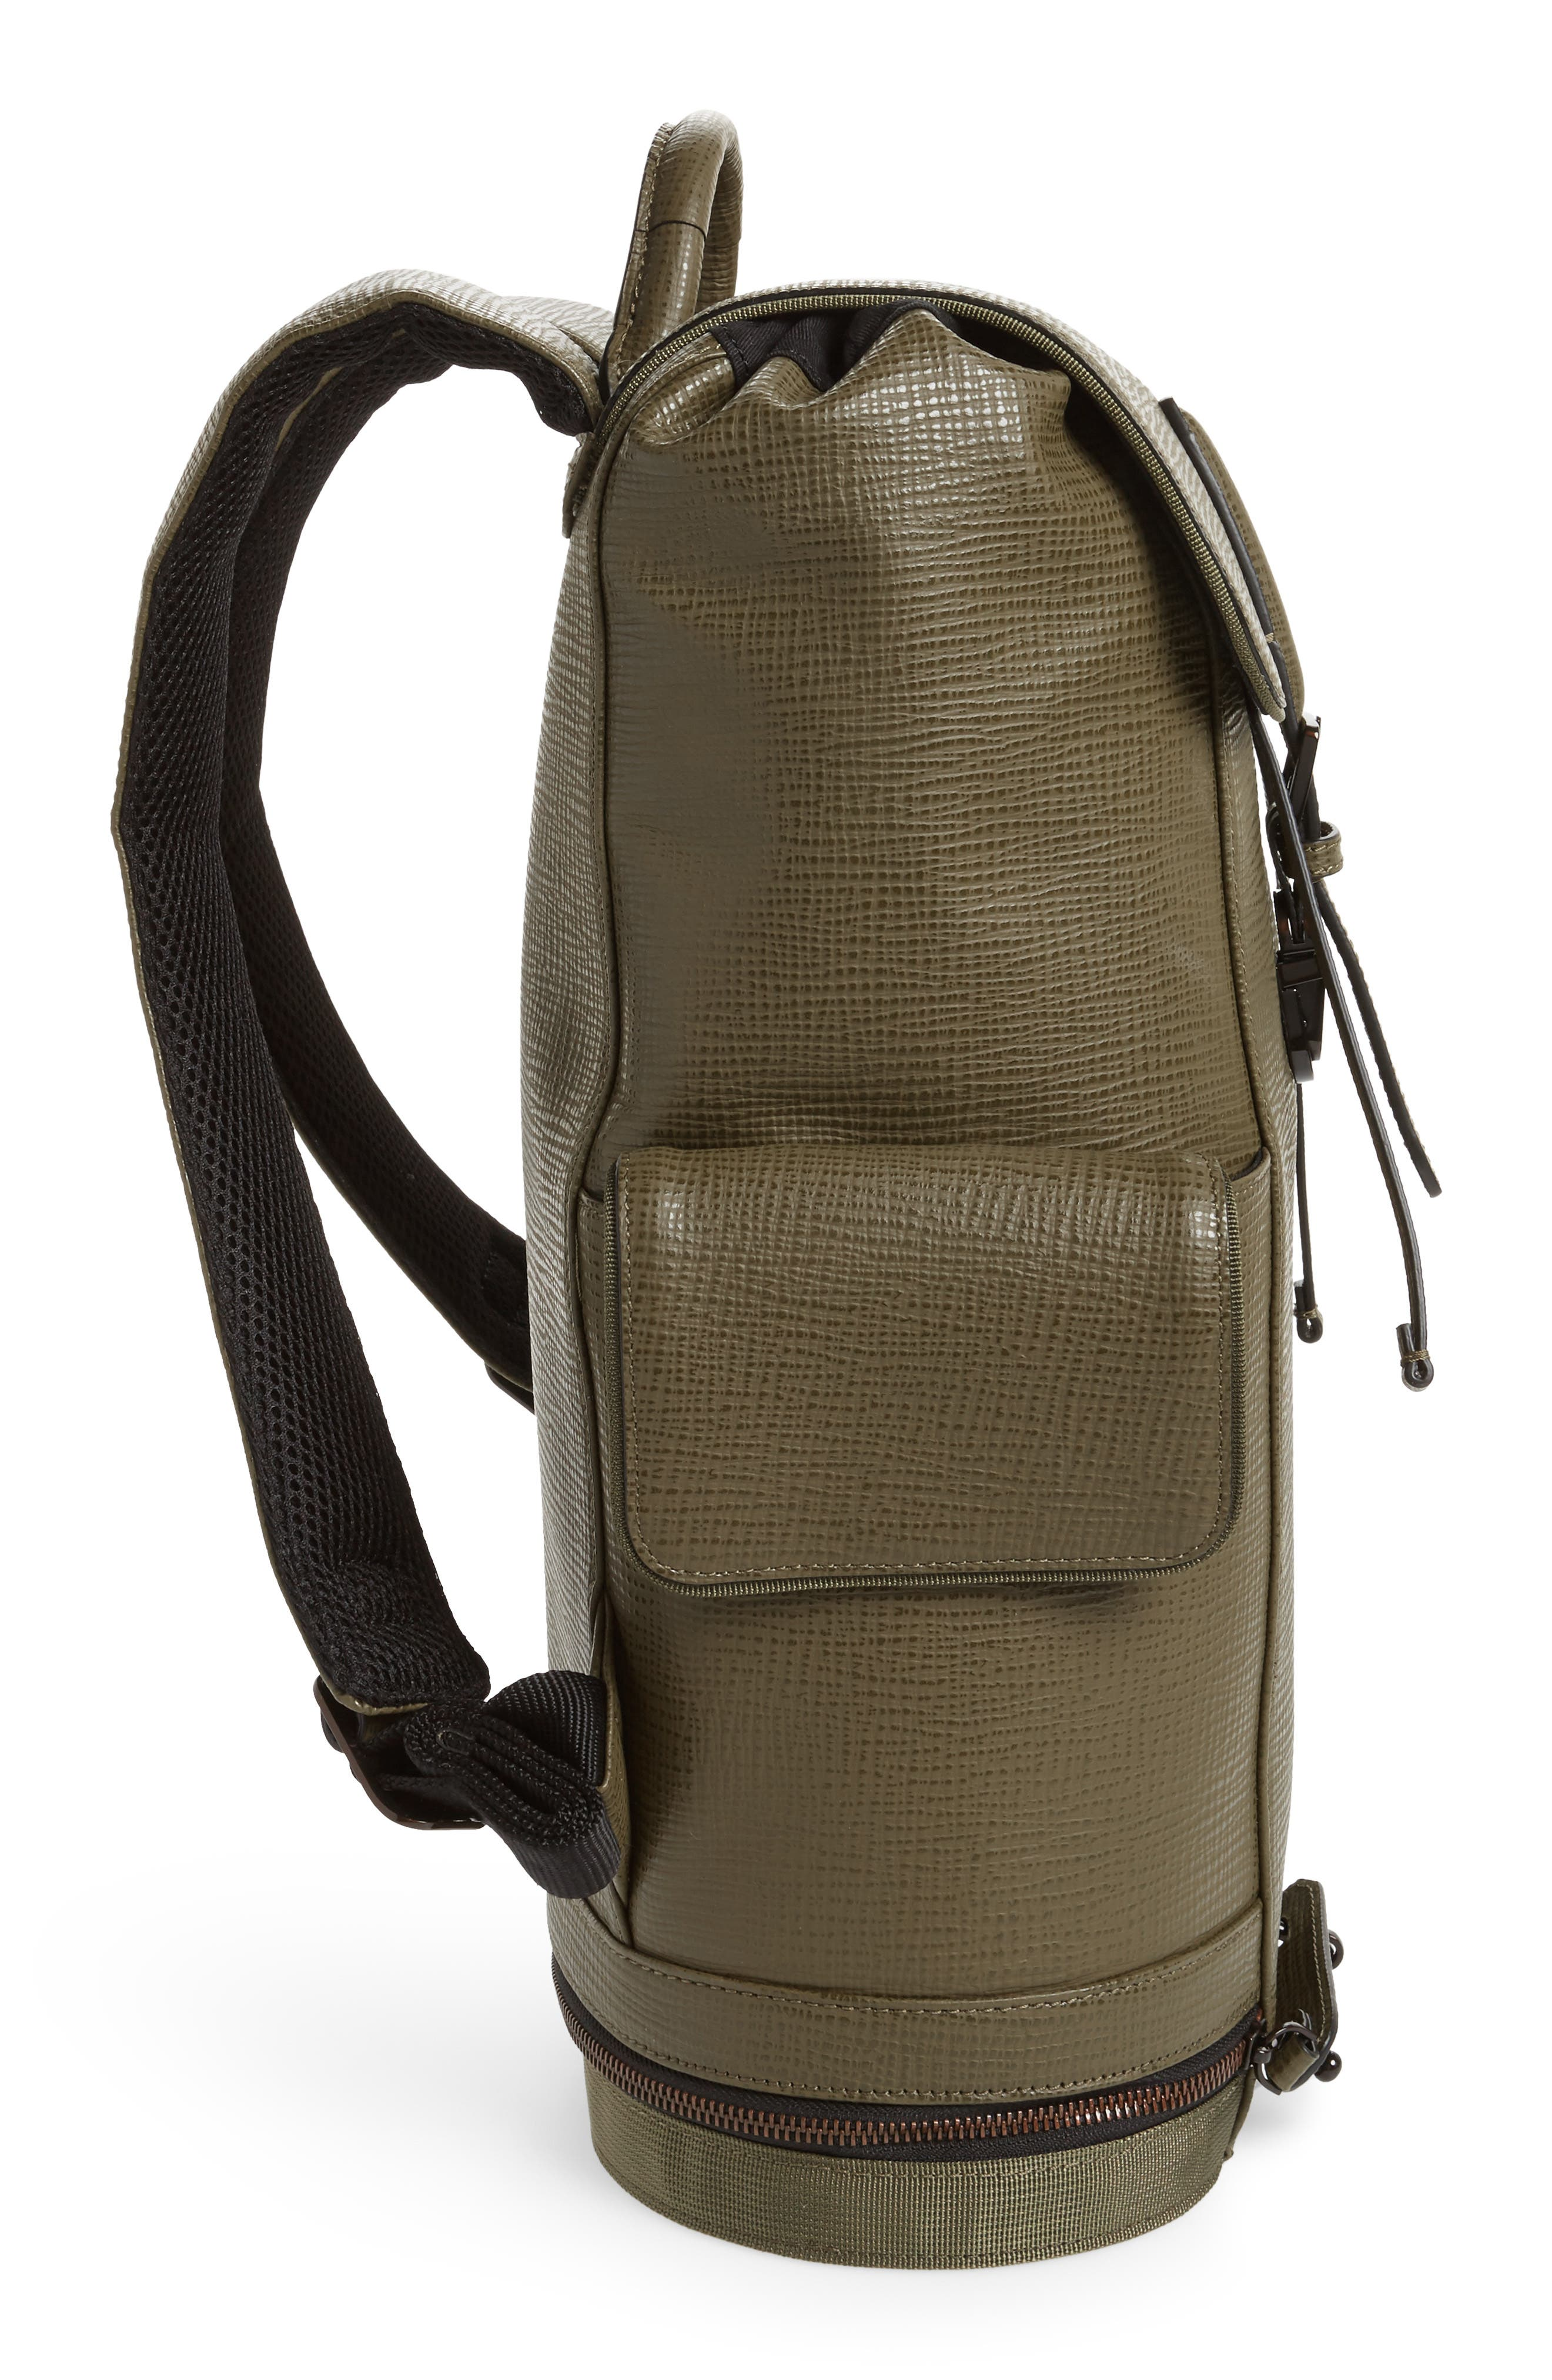 Thorr Palmelato Backpack,                             Alternate thumbnail 5, color,                             Olive